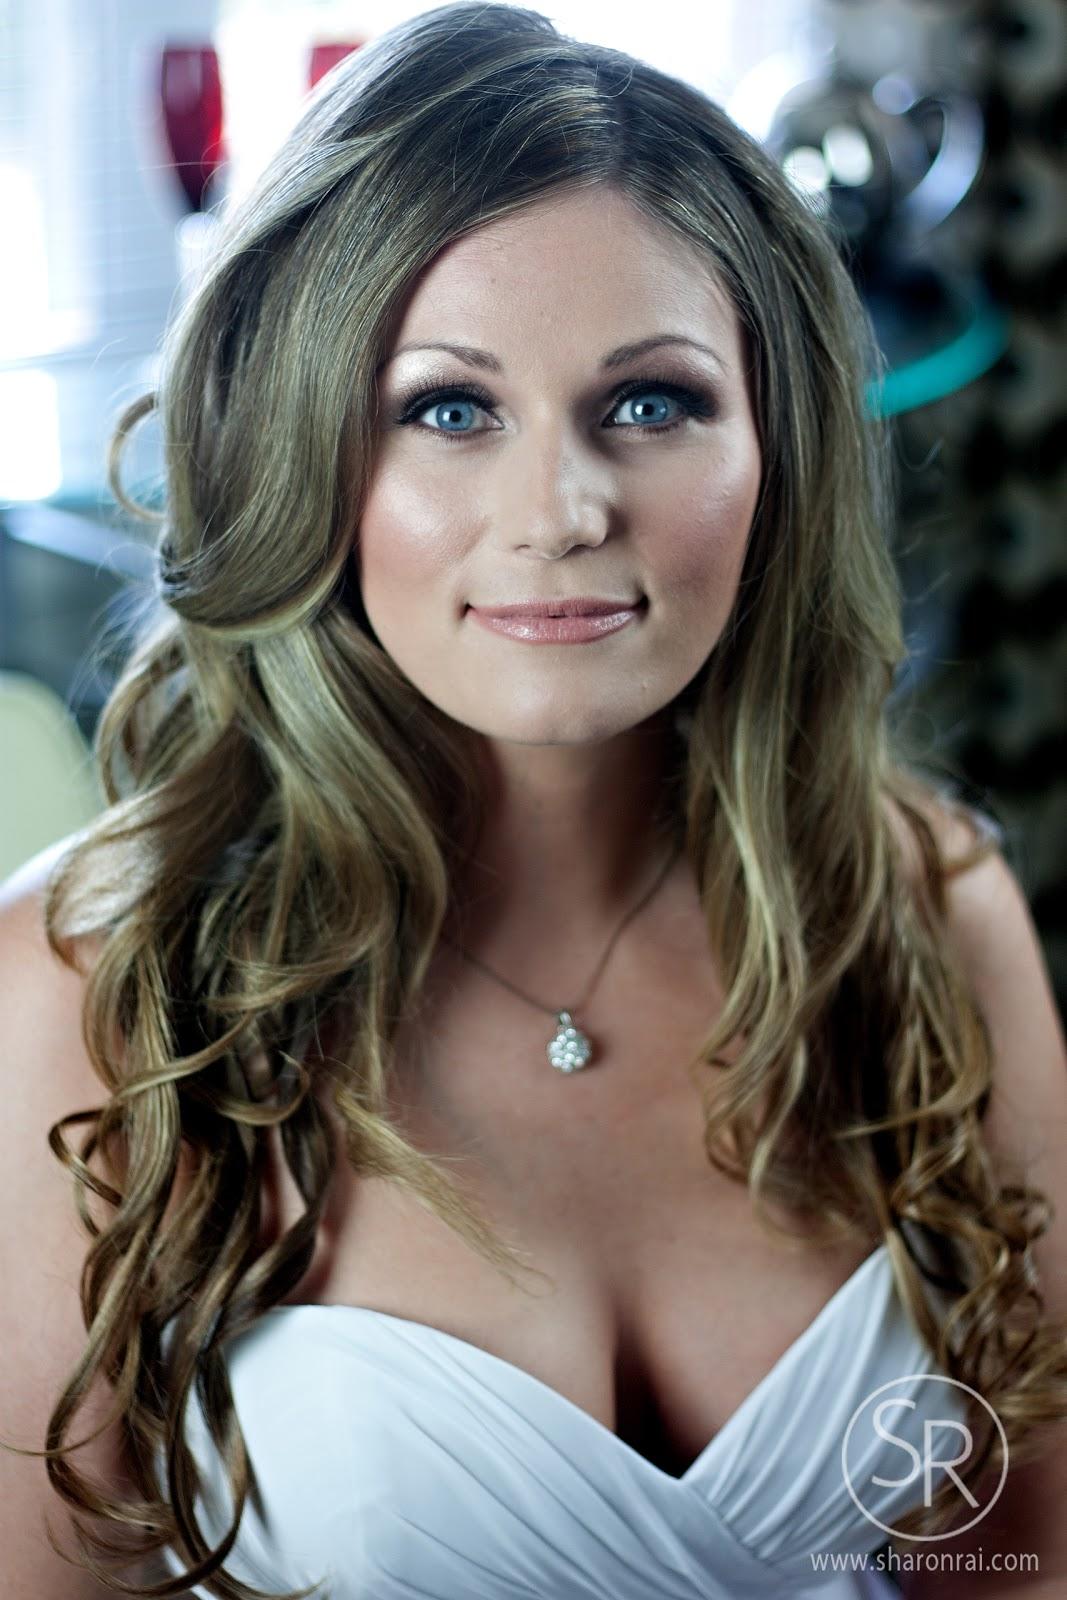 sharon rai hair & makeup artistry: hotel grand pacific wedding